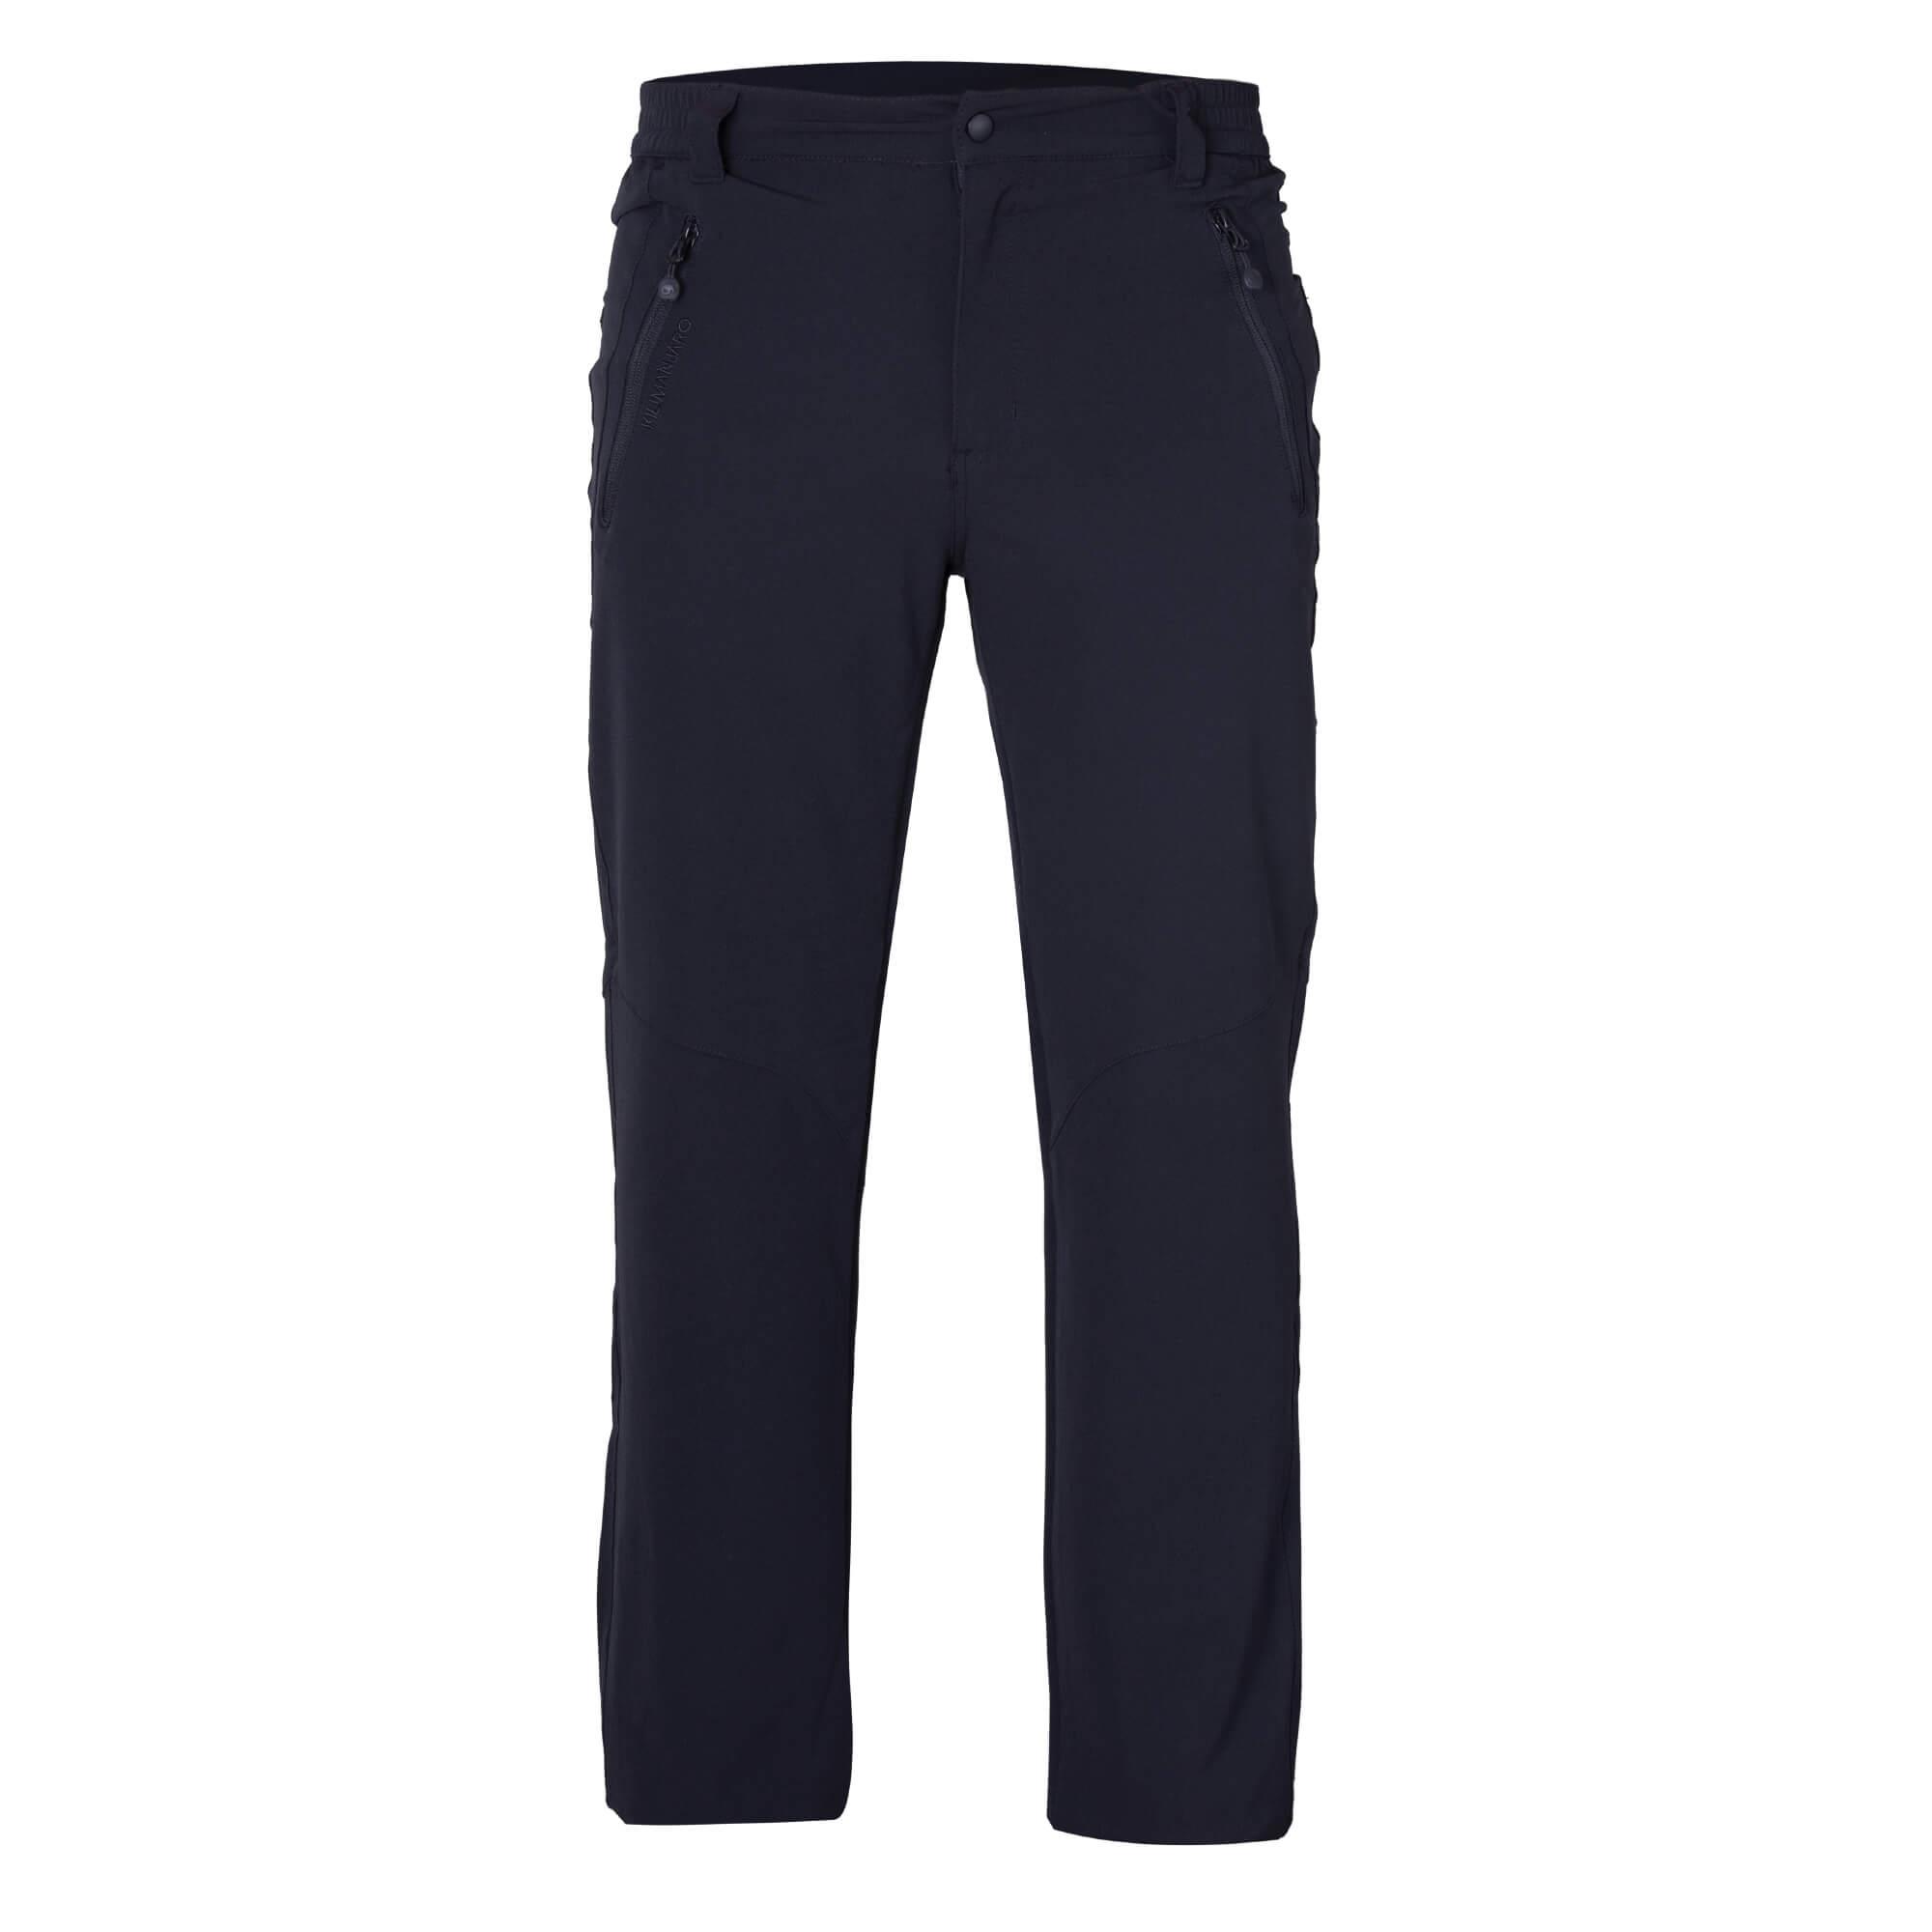 Pantaloni pentru barbati imagine